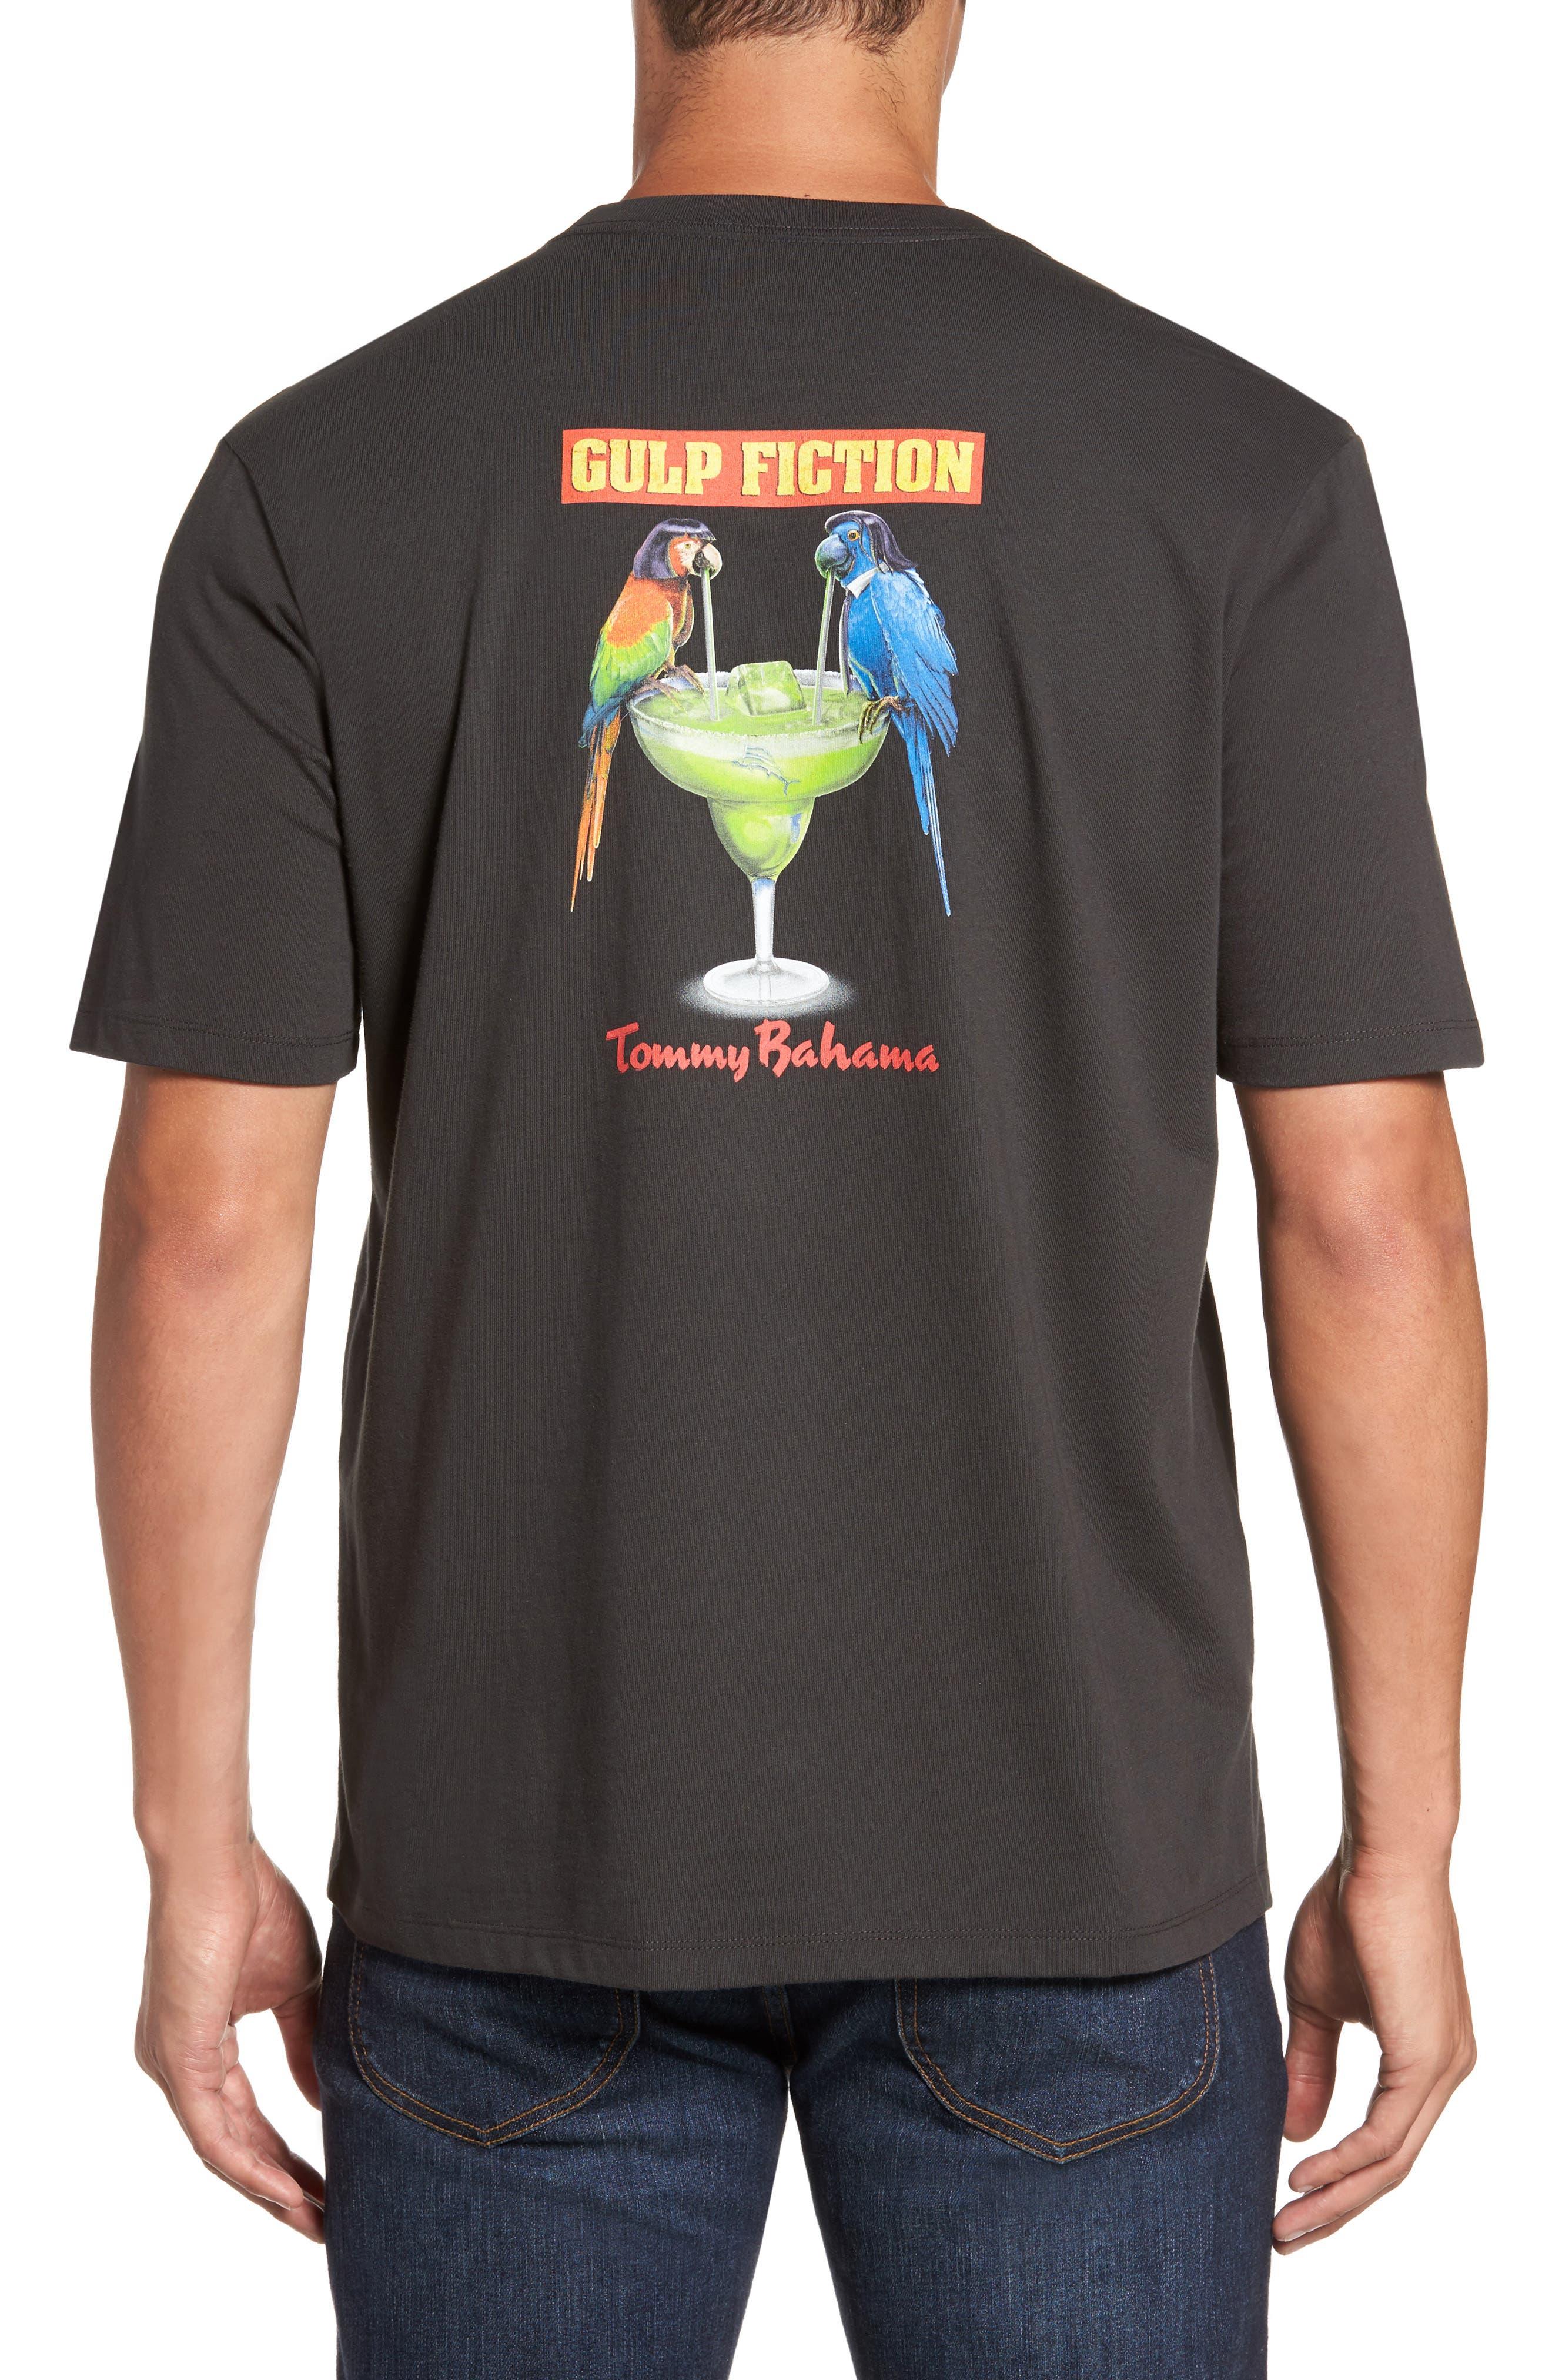 Gulp Fiction T-Shirt,                             Alternate thumbnail 2, color,                             001